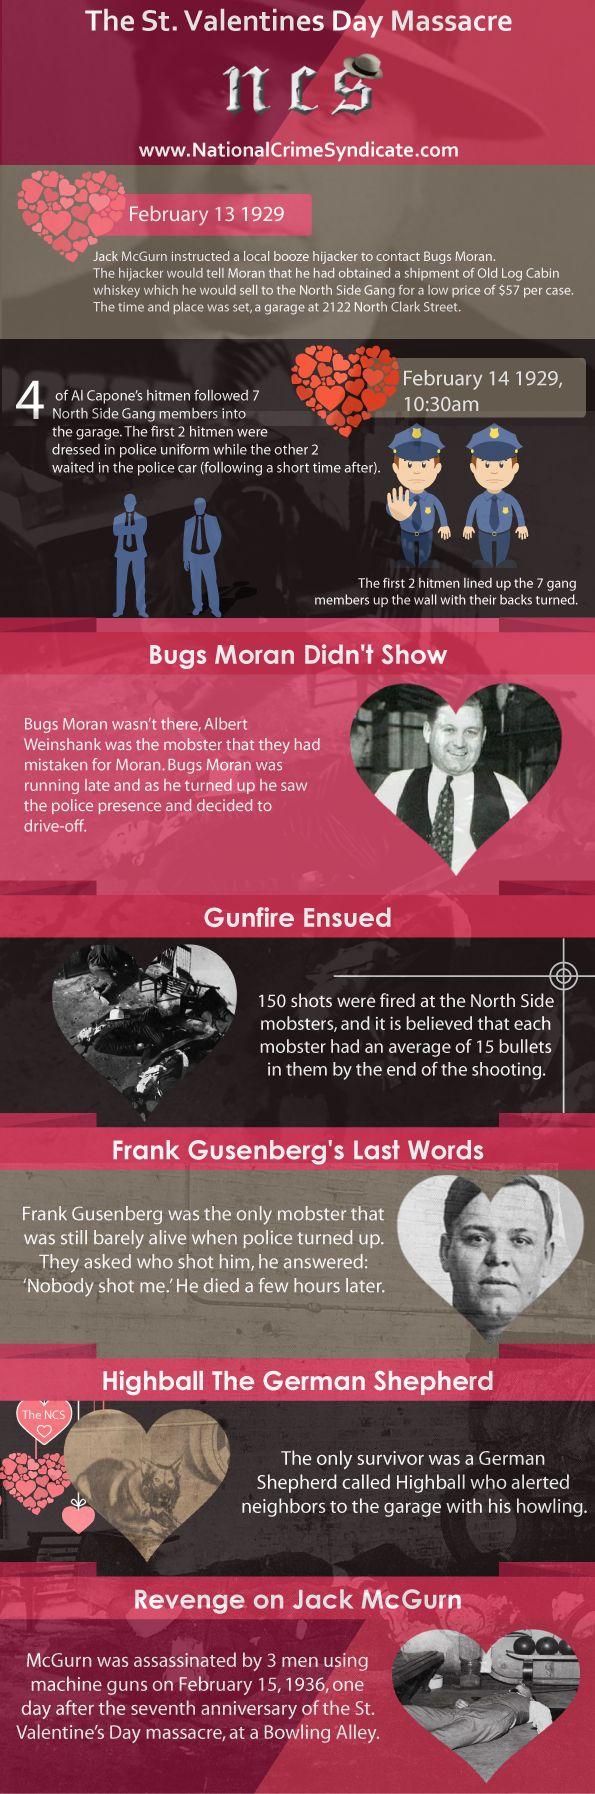 The St. Valentines Day Massacre U2013 Key Facts Infographic